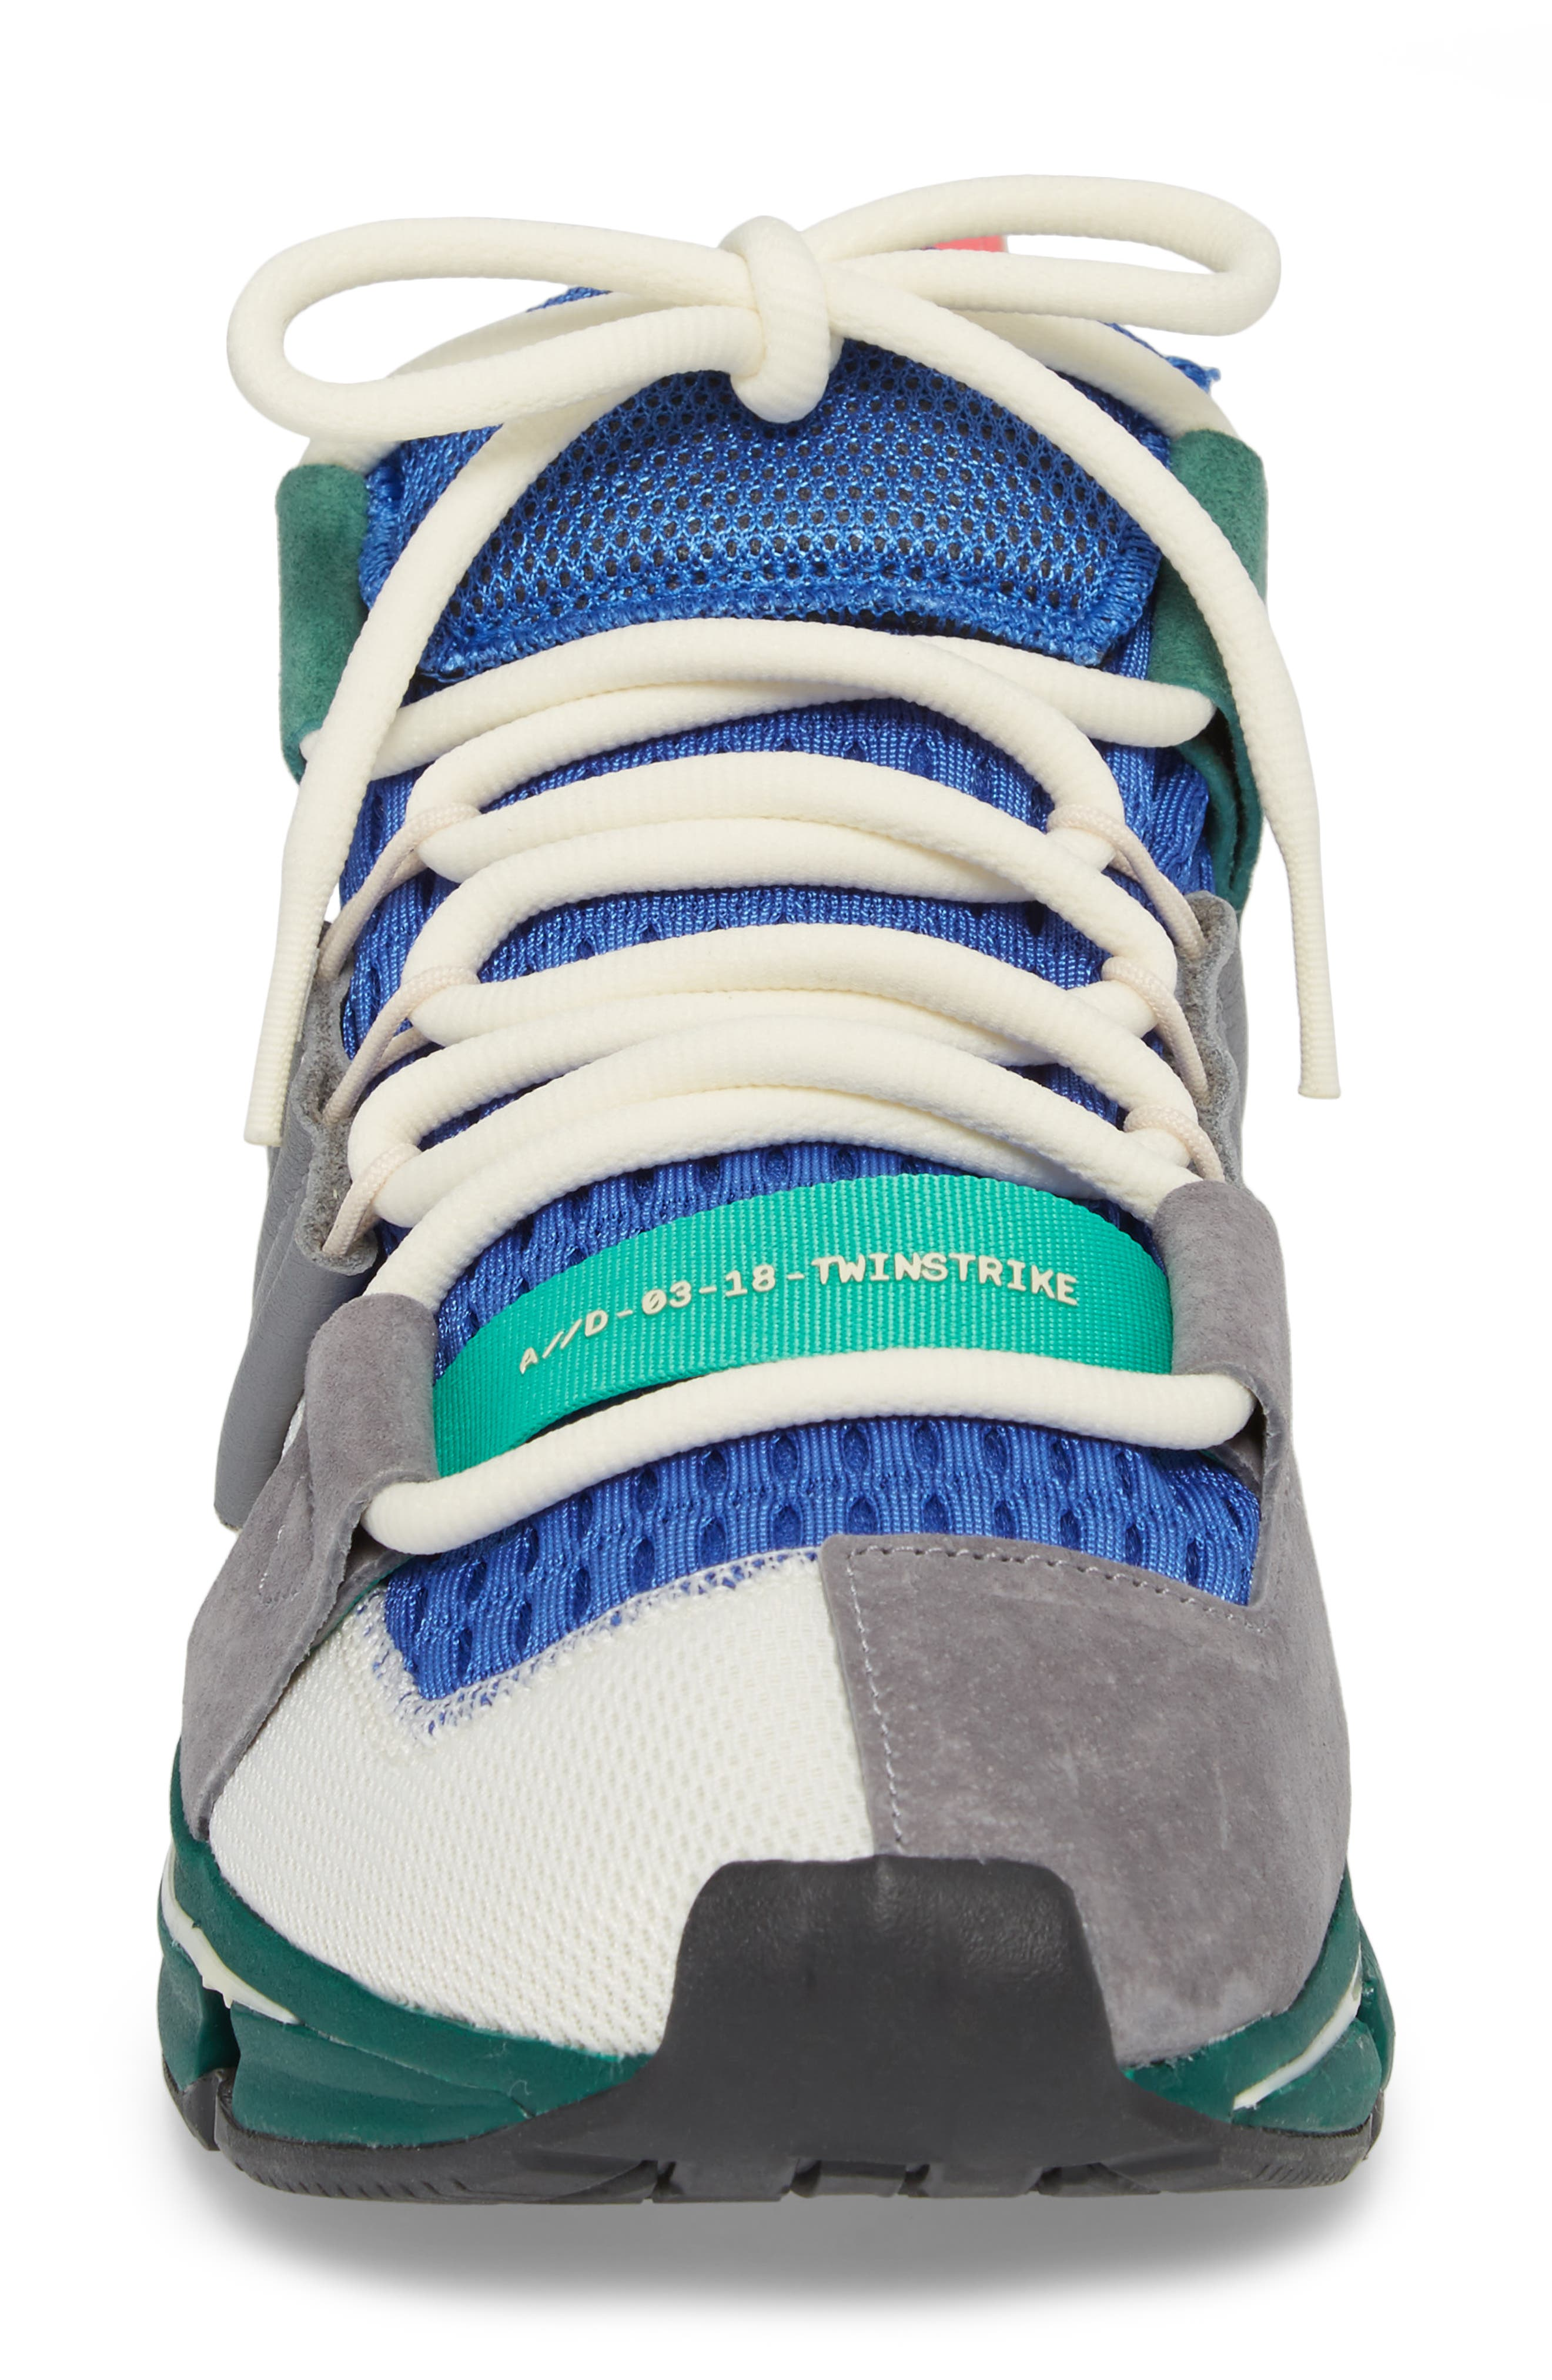 Twinstrike ADV Sneaker,                             Alternate thumbnail 4, color,                             400